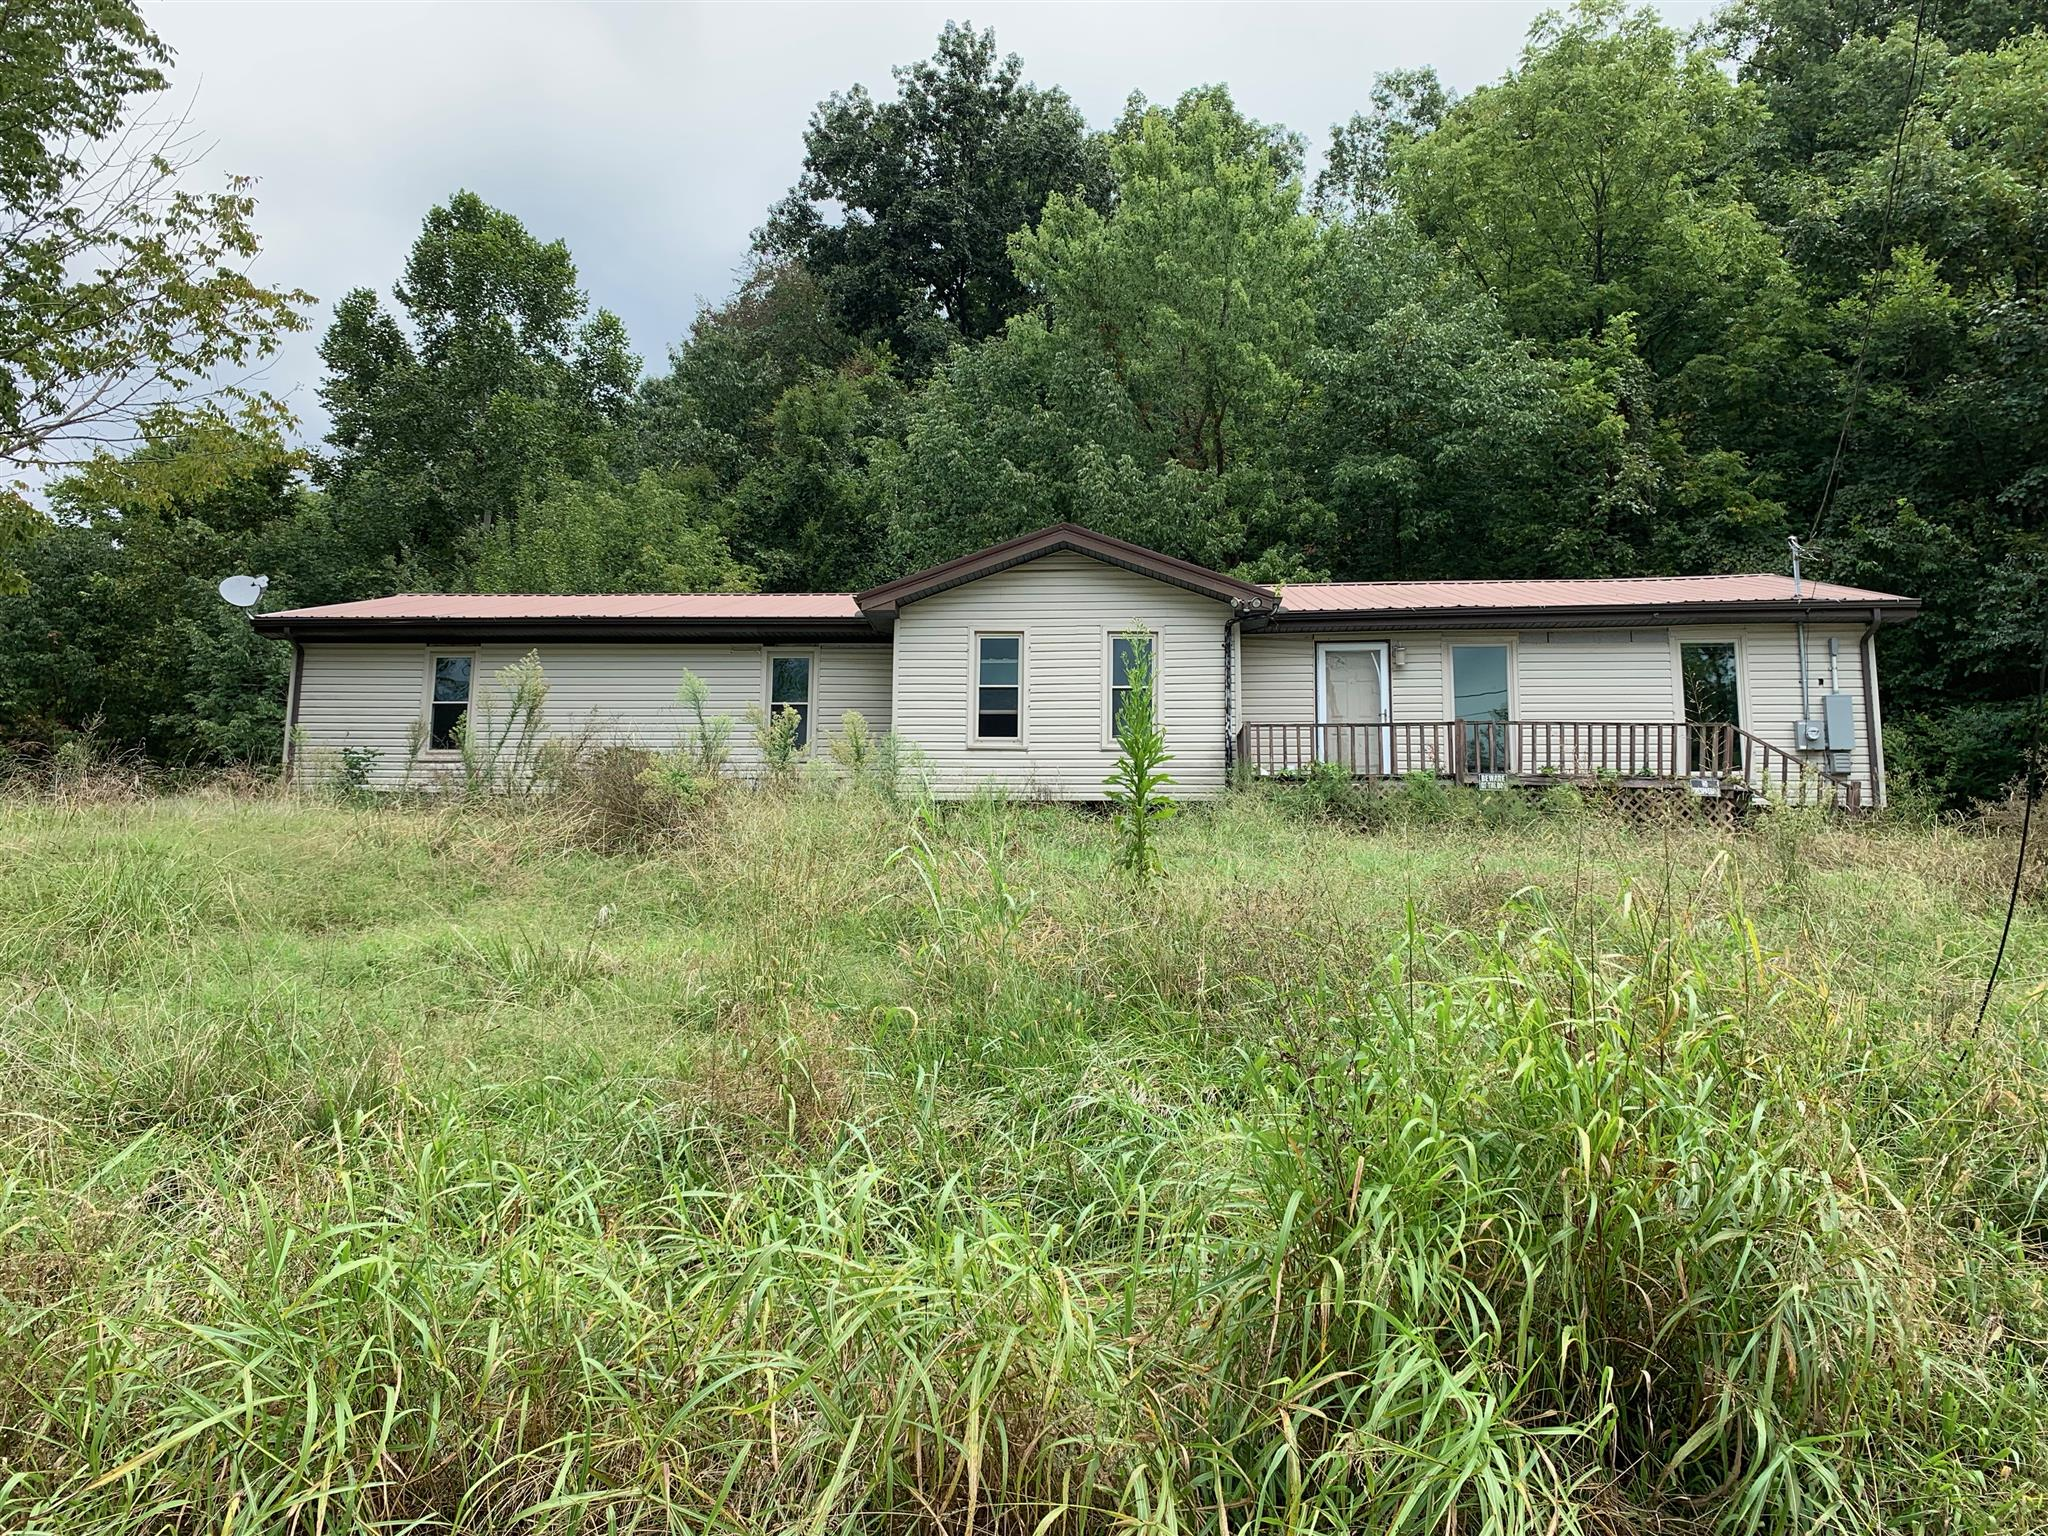 1206 Dobbins Pike, Gallatin, TN 37066 - Gallatin, TN real estate listing